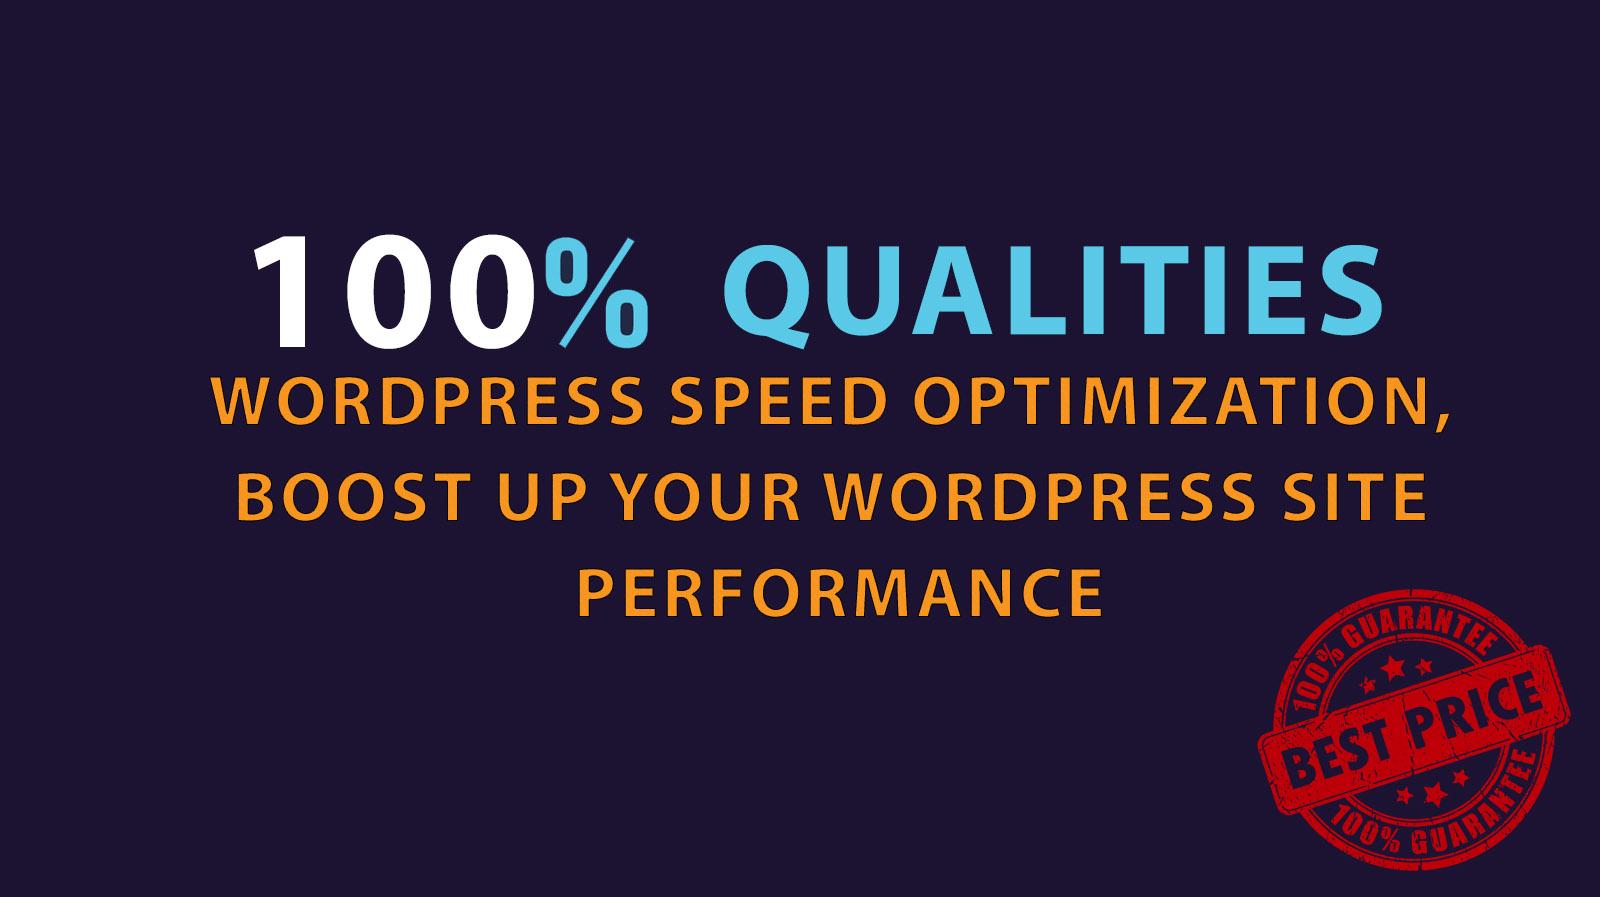 Wordpress Speed Optimization - Guaranteed Change in Download Speed